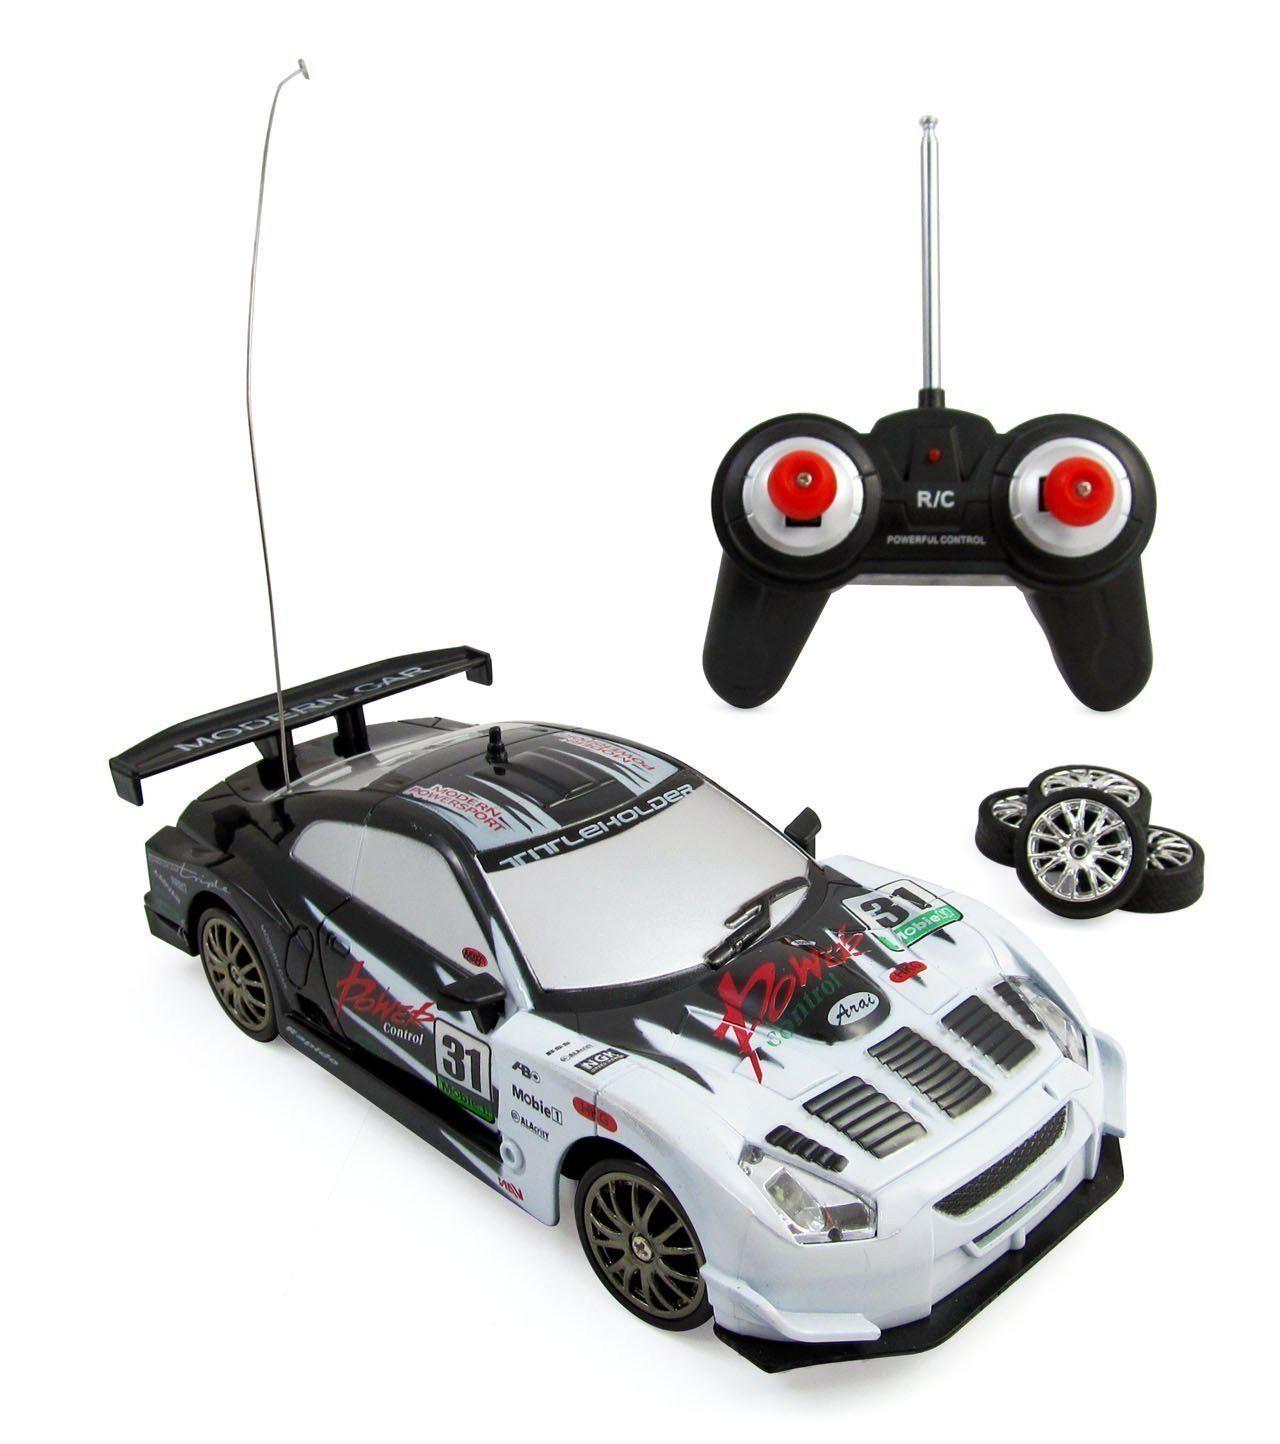 1 24 Super Fast Rc Drift Race Car Remote Control Cars Toys Cool Sports Cars Rc Drift Cars